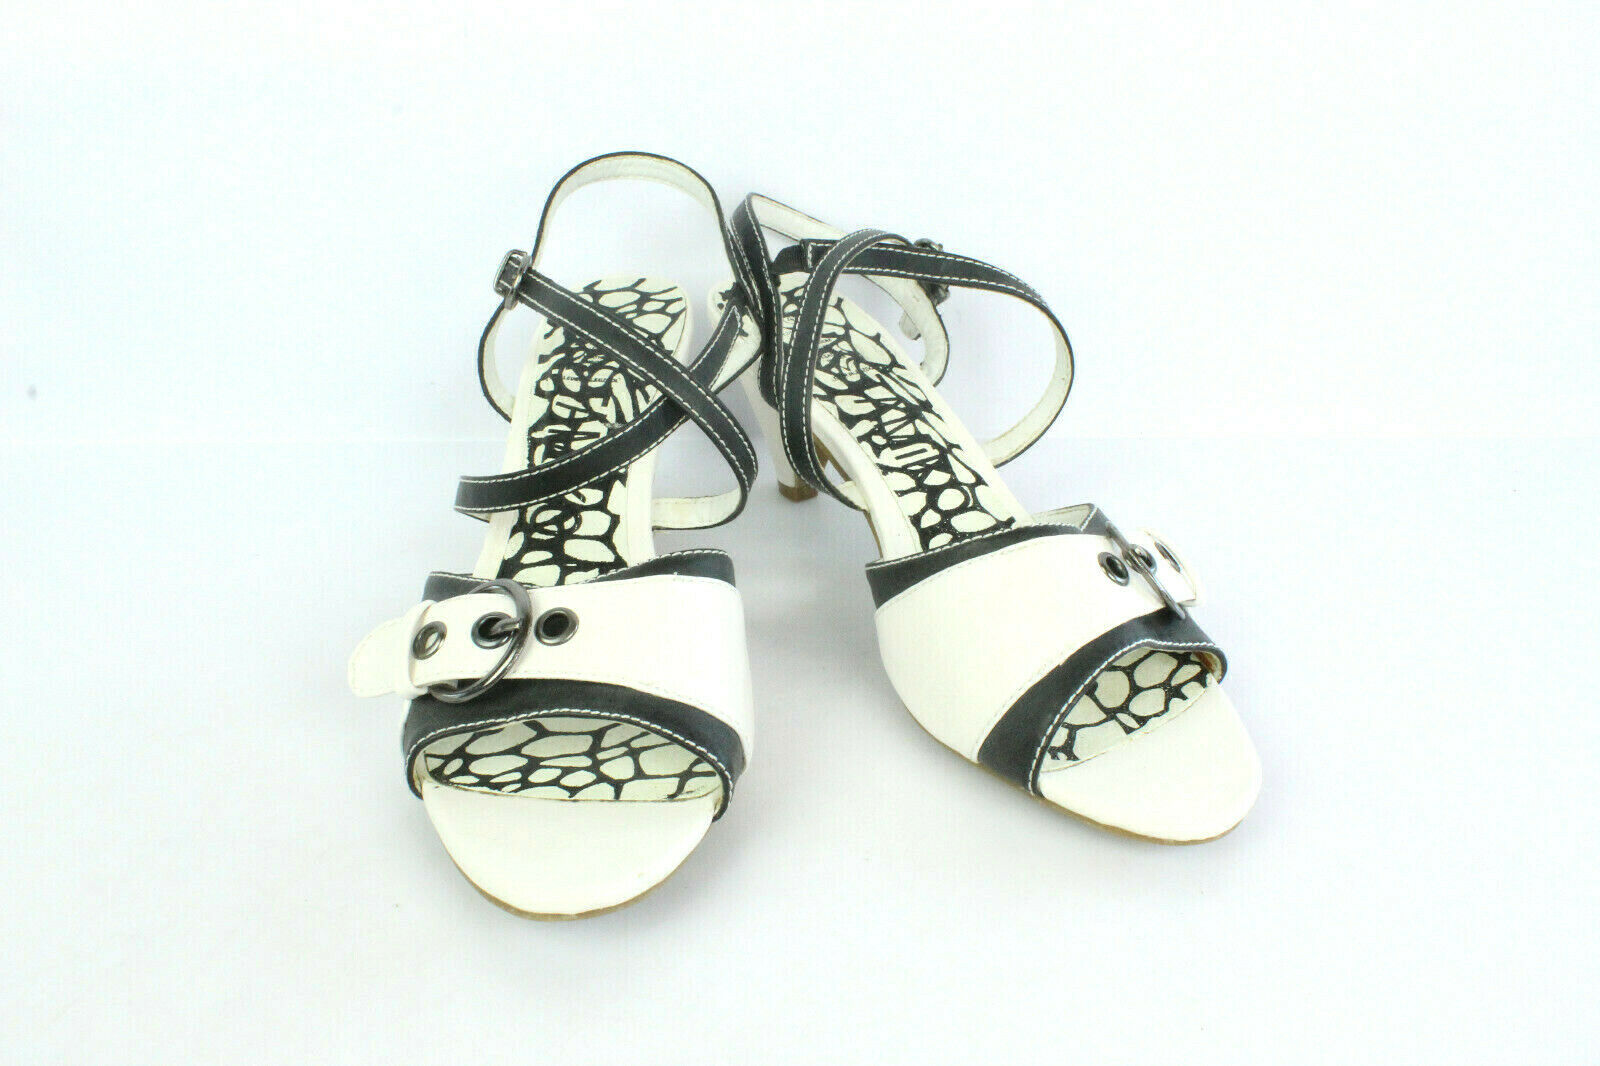 Escarpins TAMIKO Cuir white et black T 40   UK 6.5 TRES BON ETAT